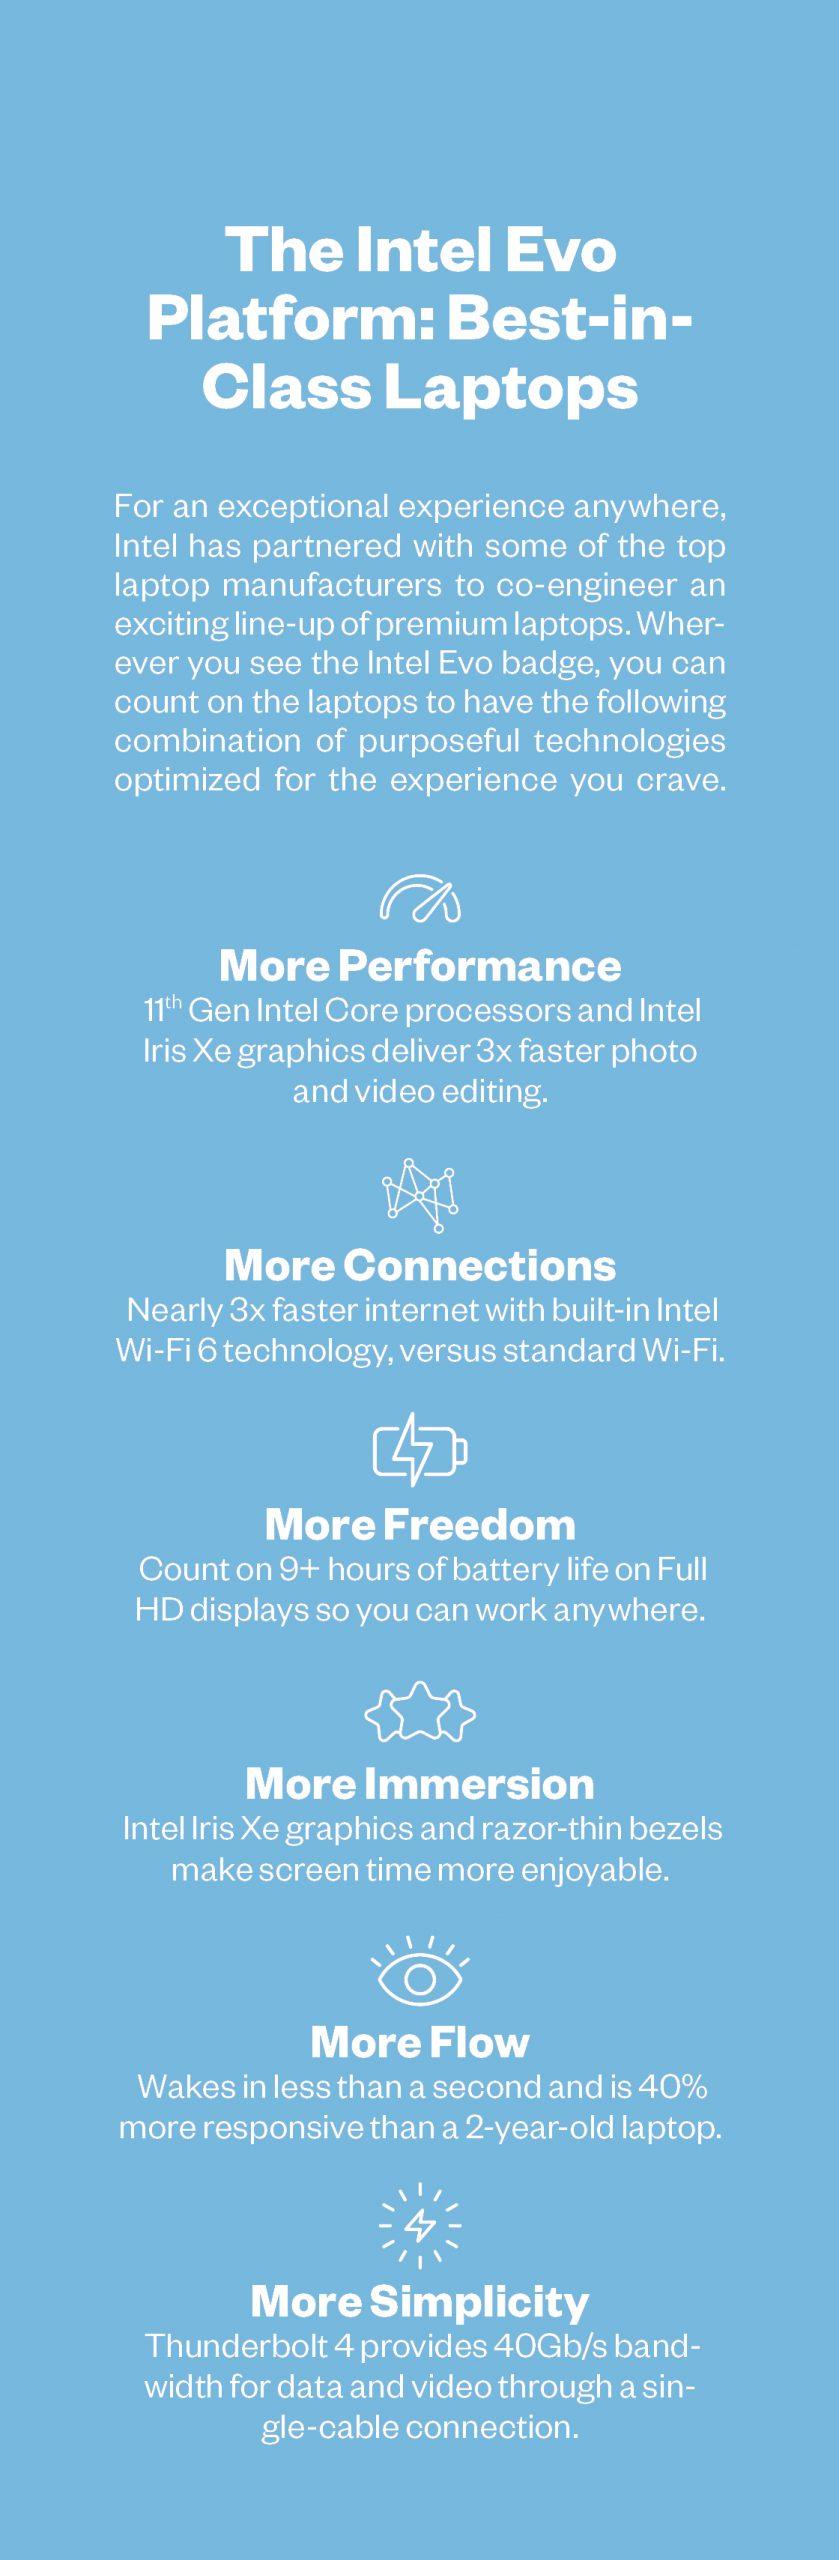 intel evo premium laptops infographic